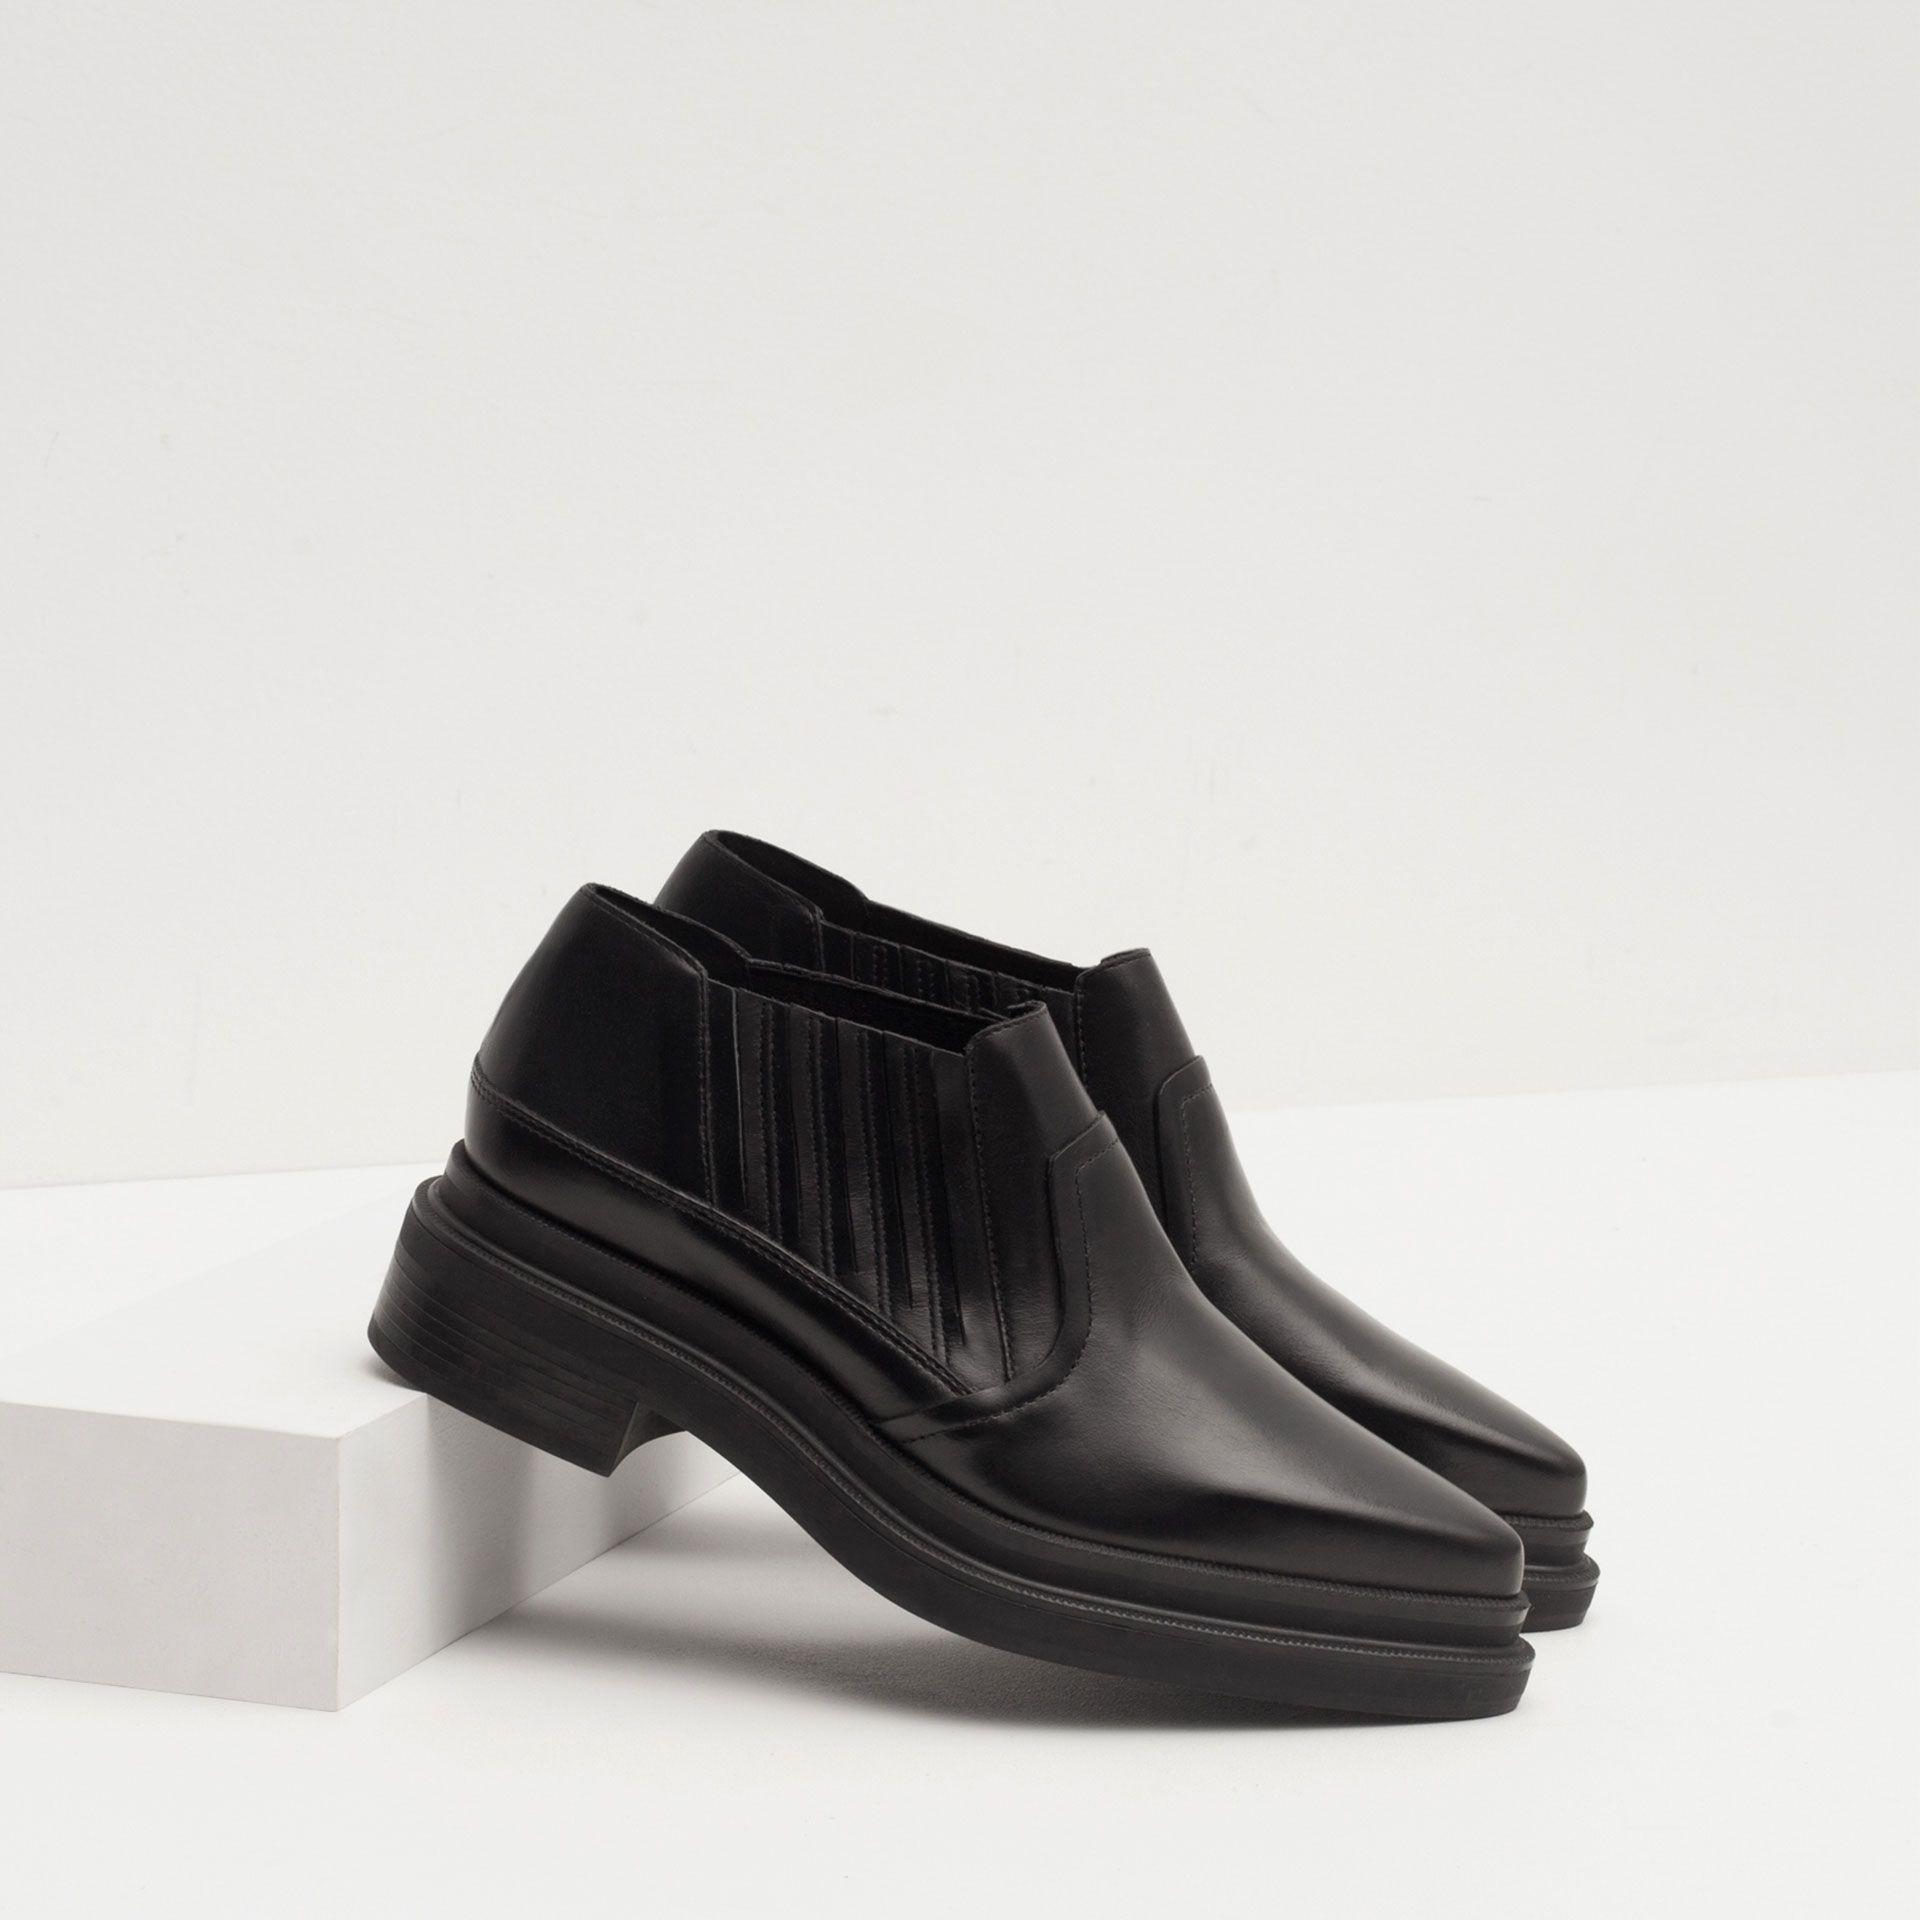 Chaussures à bout pointu Zara femme aHvGOI